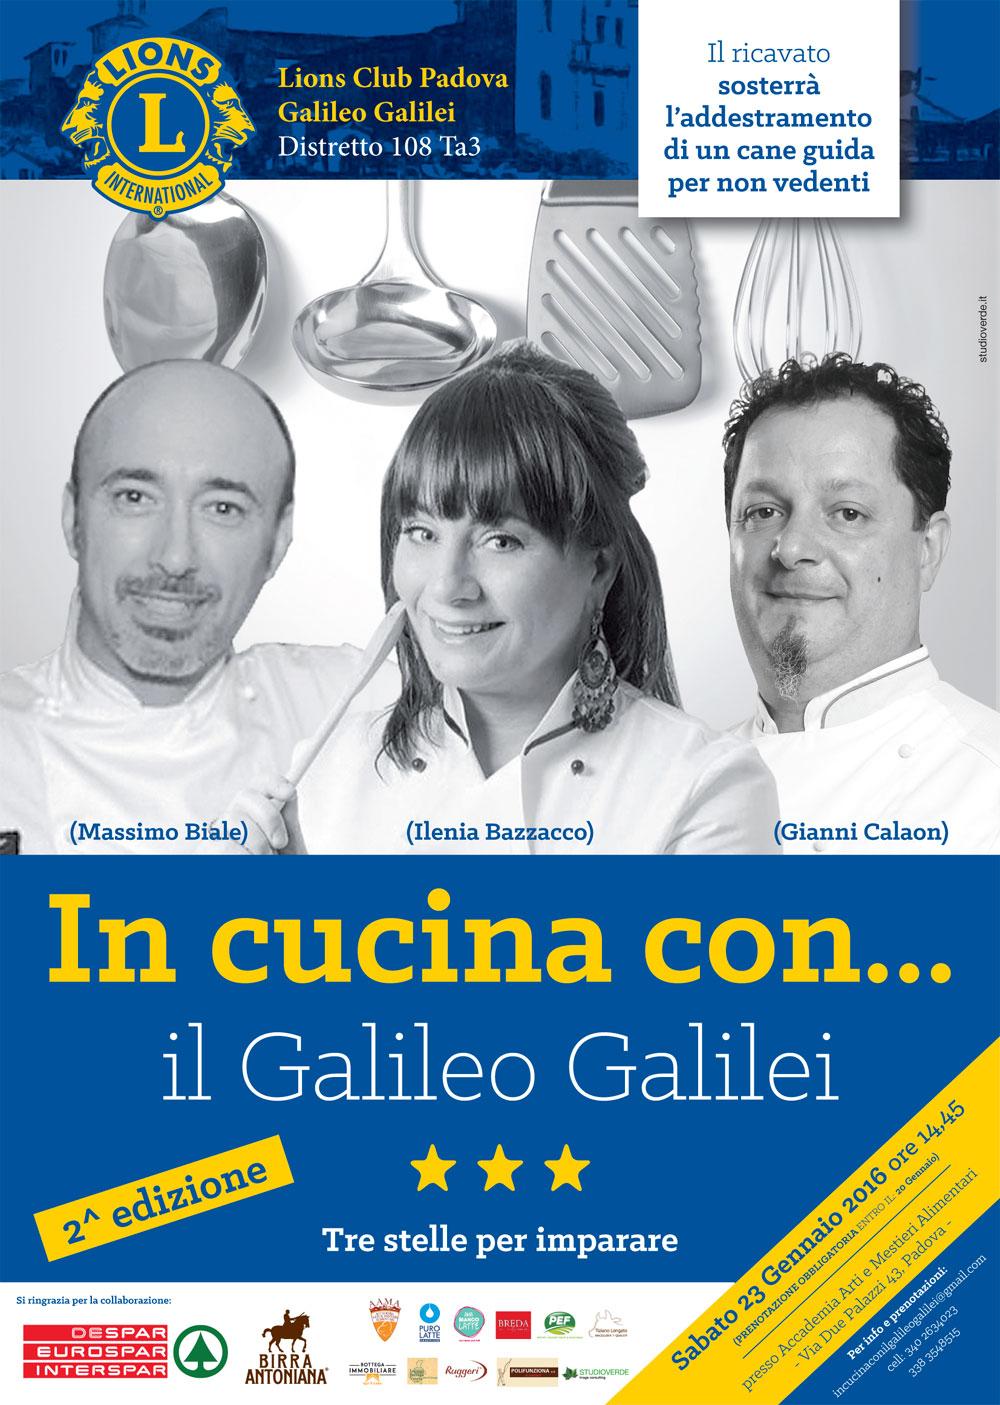 locandina-cucina-galileo-galilei-lions2(3)